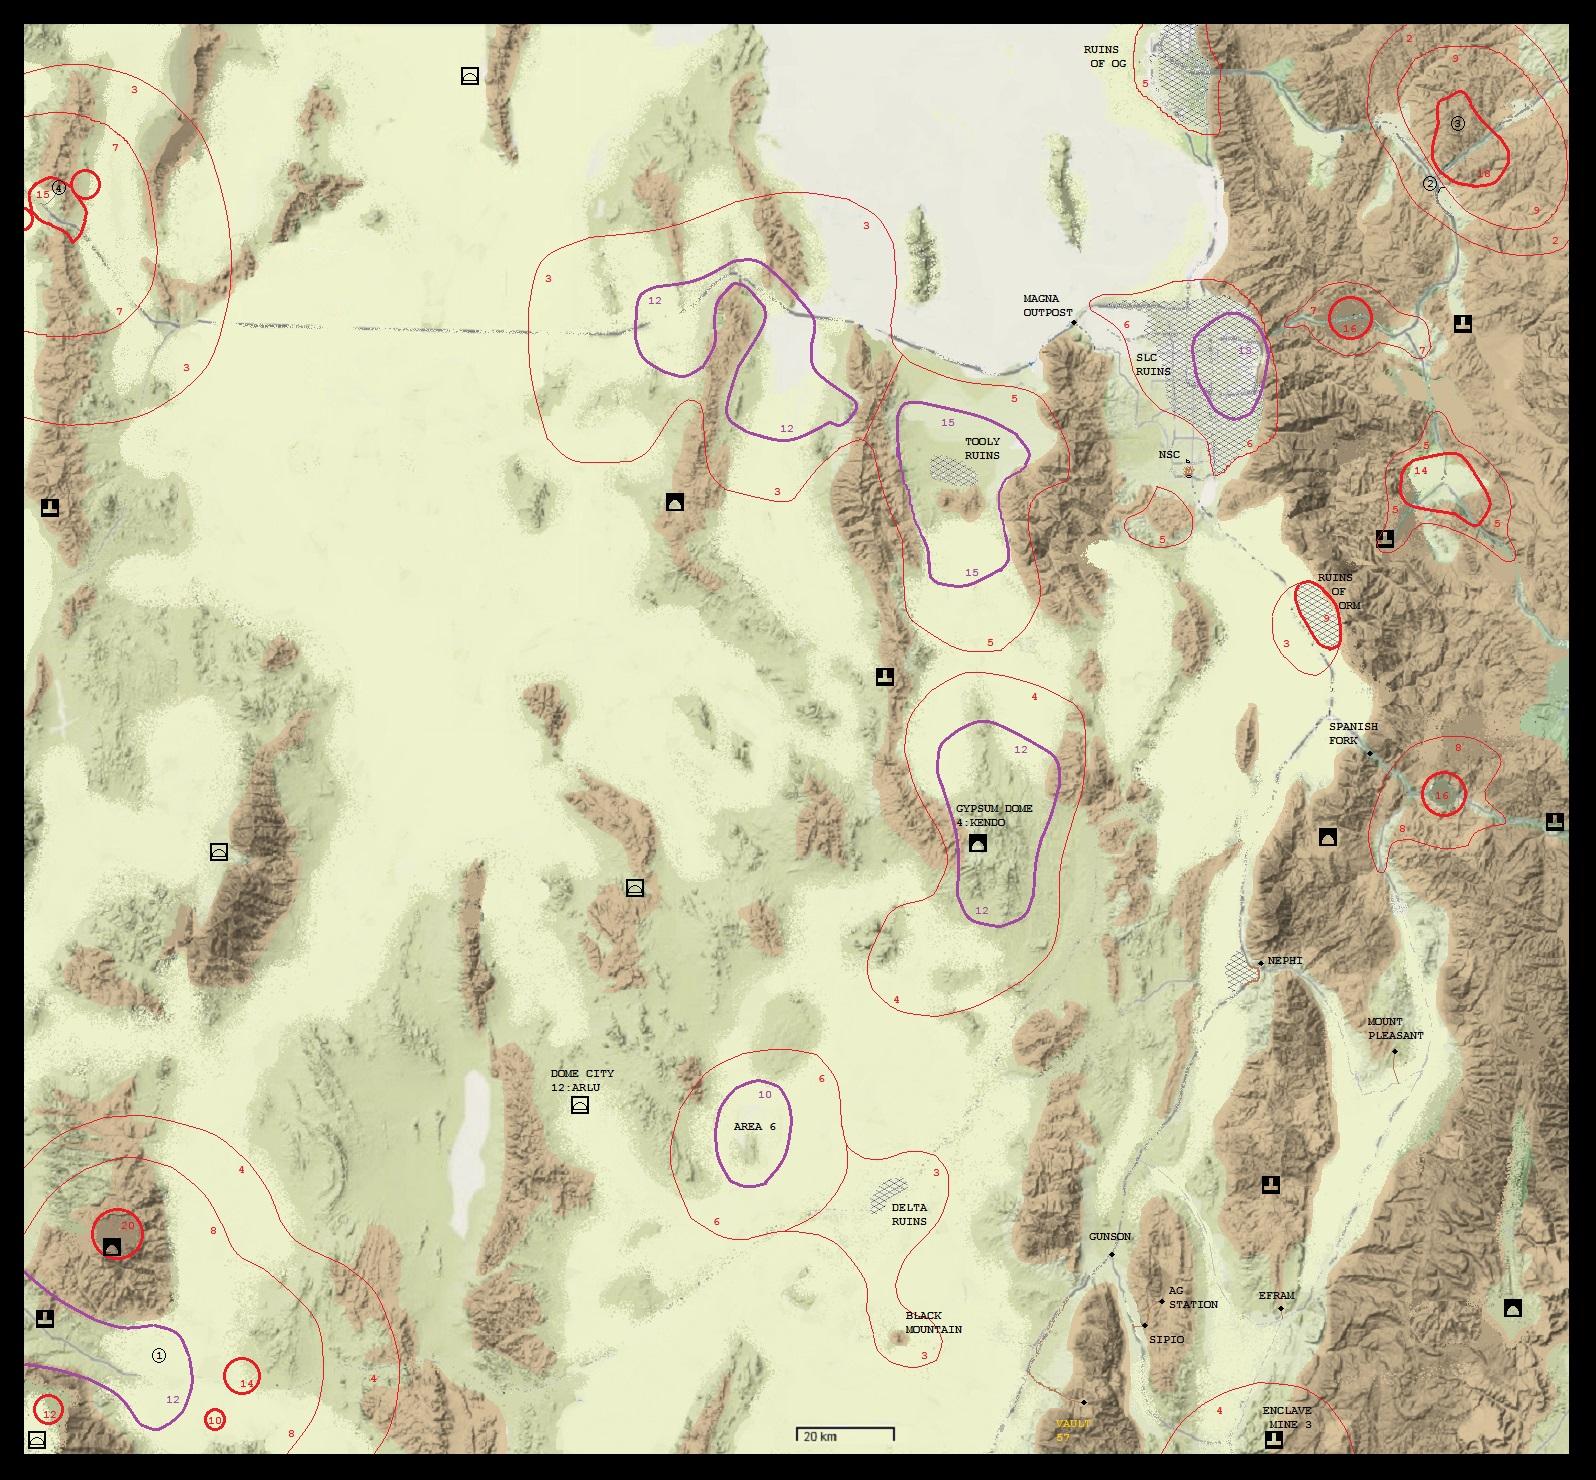 GW_The_Utah_Wasteland.jpg